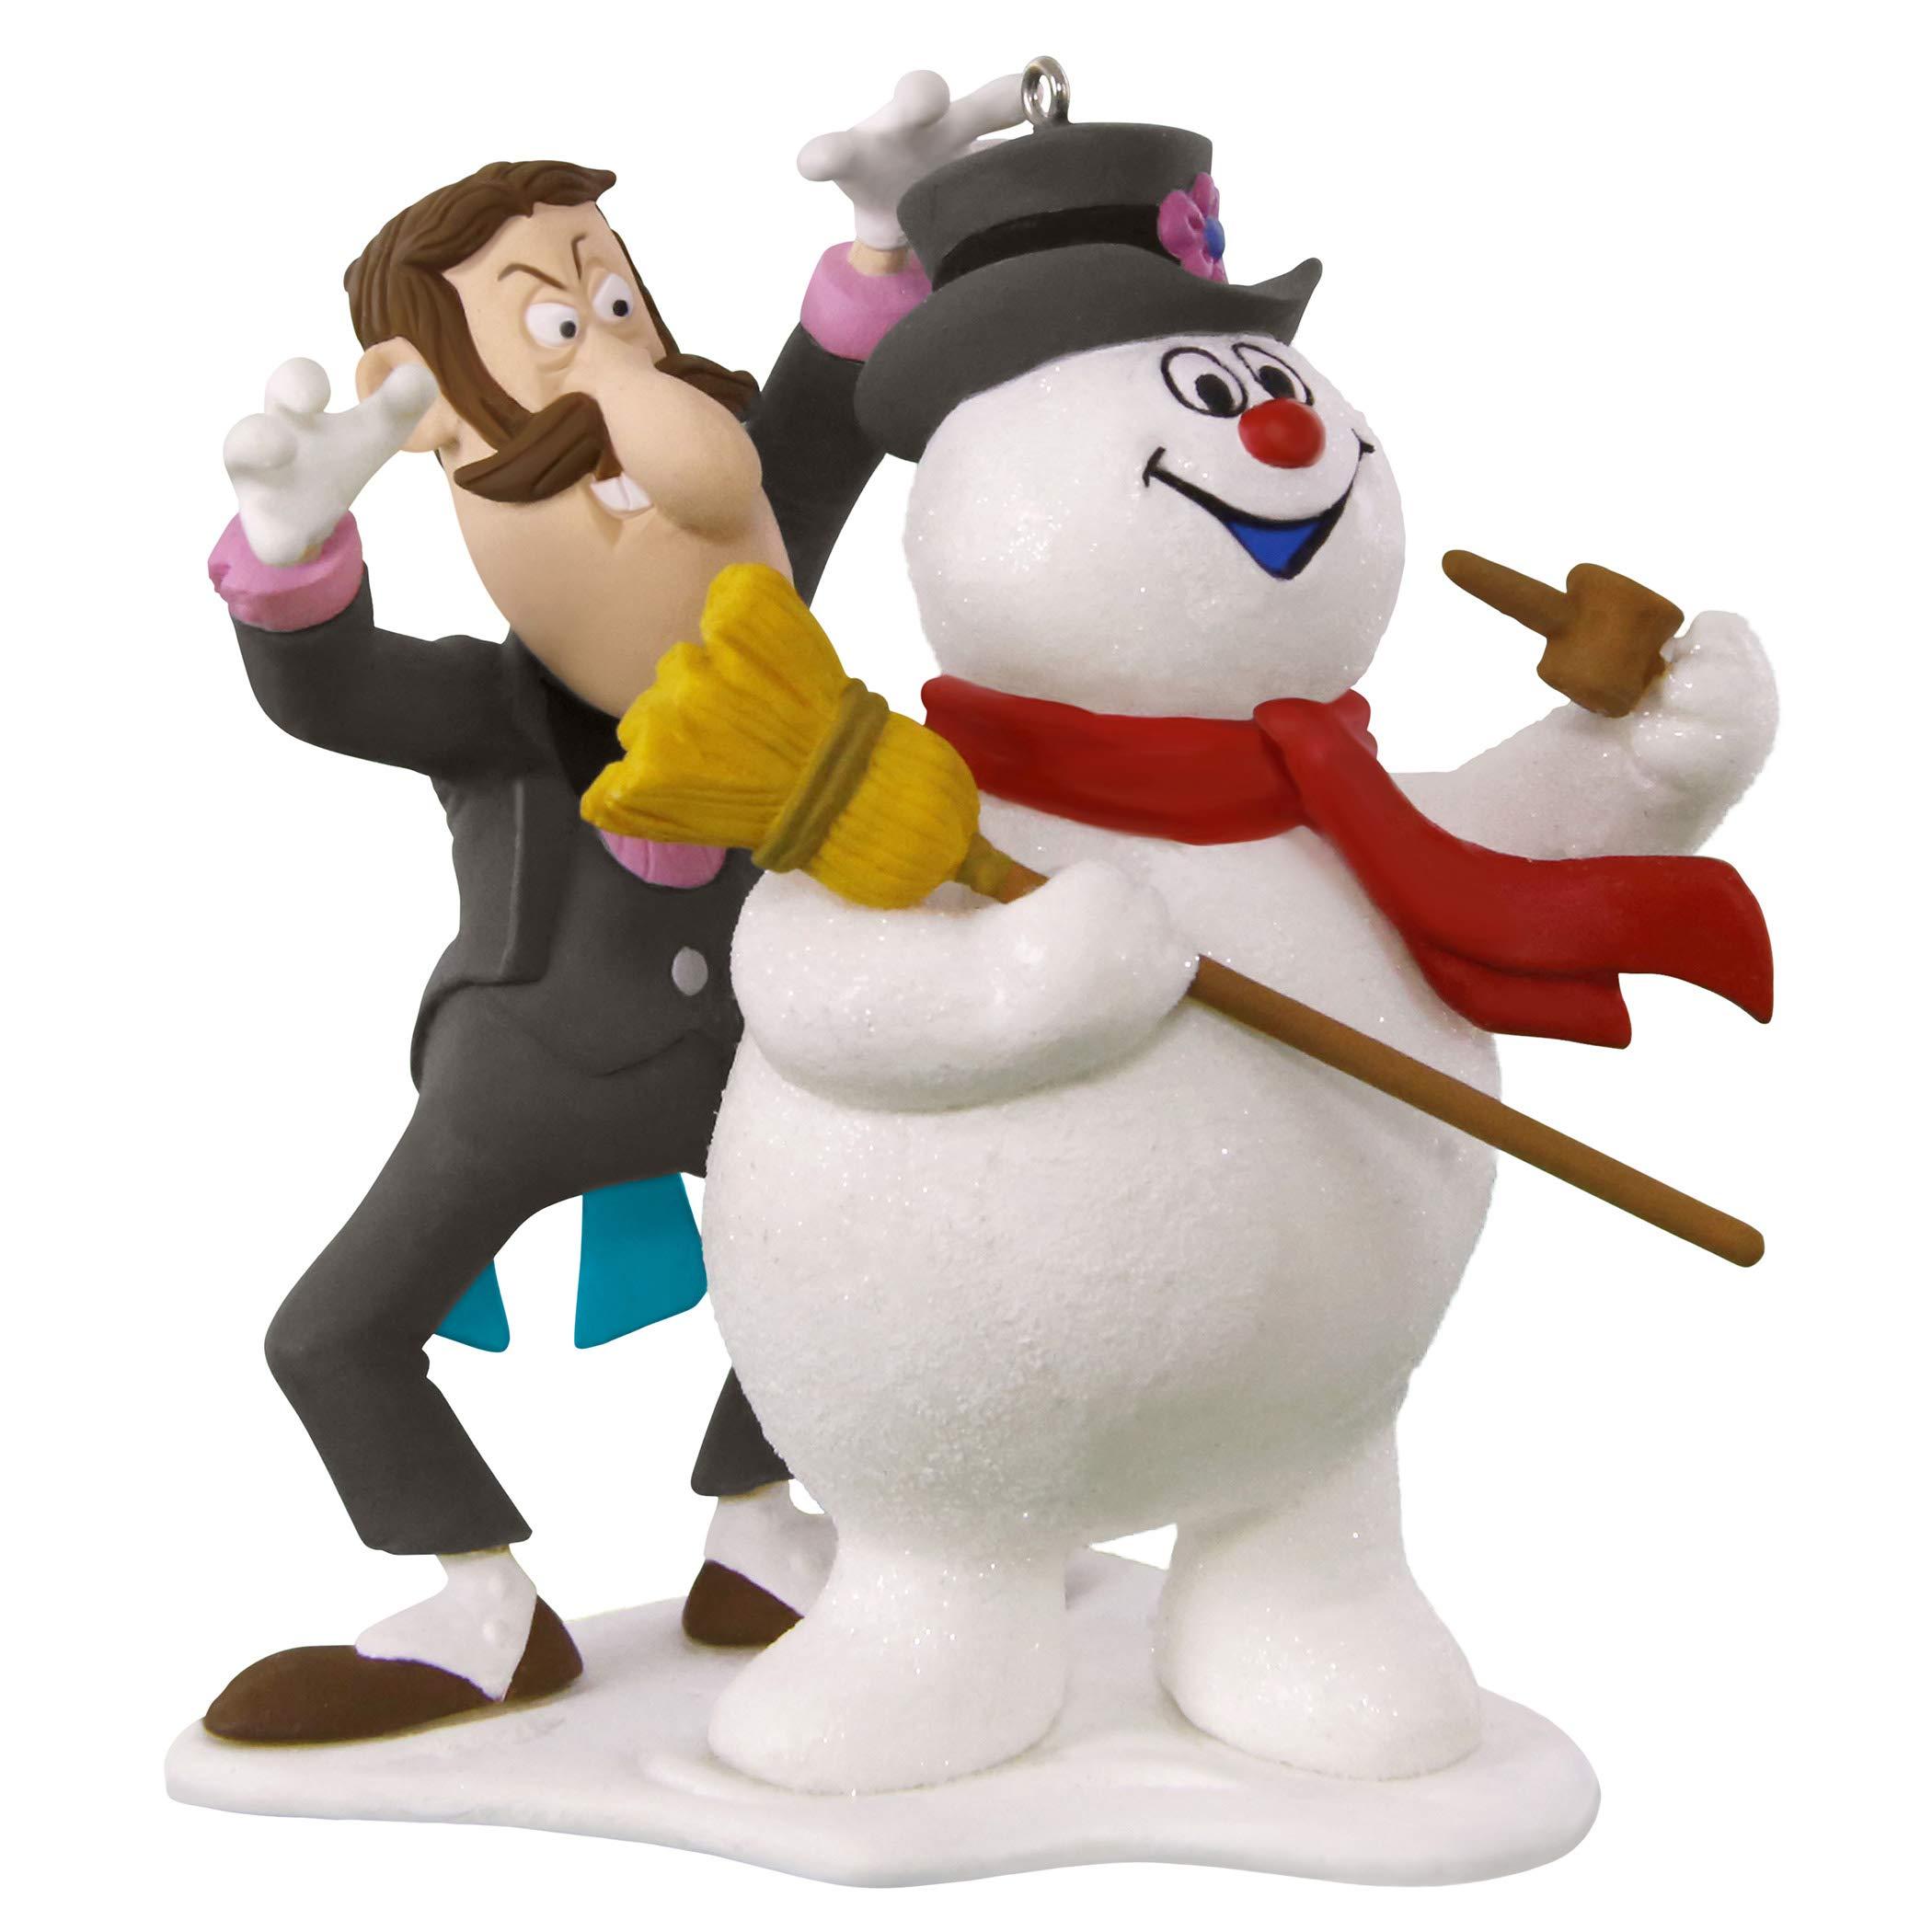 Image of 2019 Hallmark Frosty the Snowman Ornament